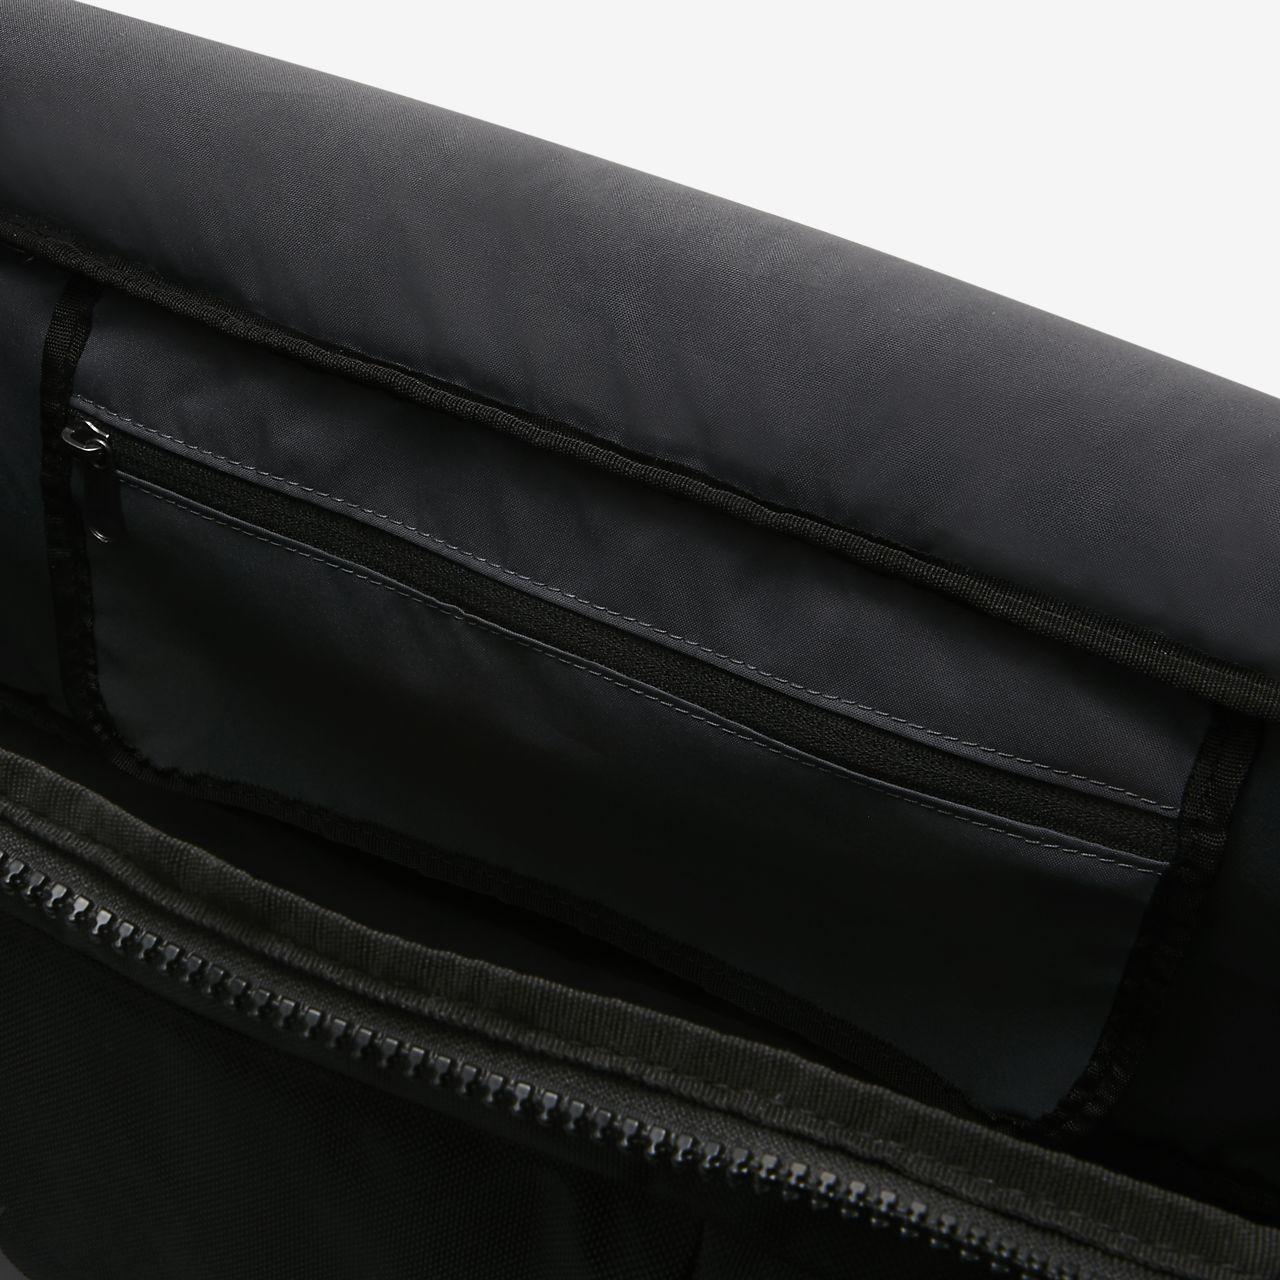 0ef6b3fa387 Nike Vapor Power Men s Training Duffel Bag (Small). Nike.com CA